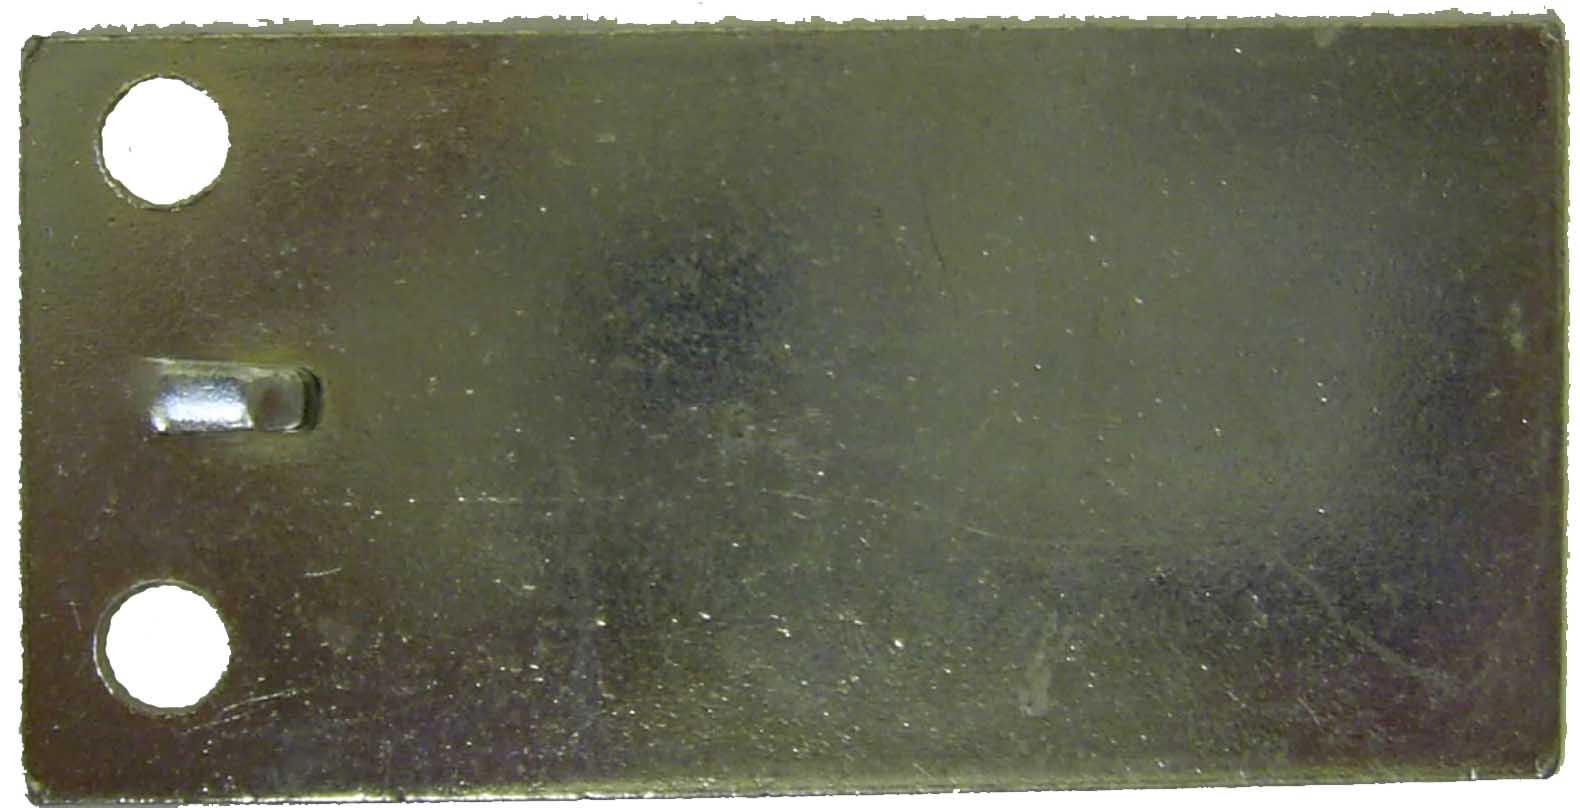 15A-00515A-008